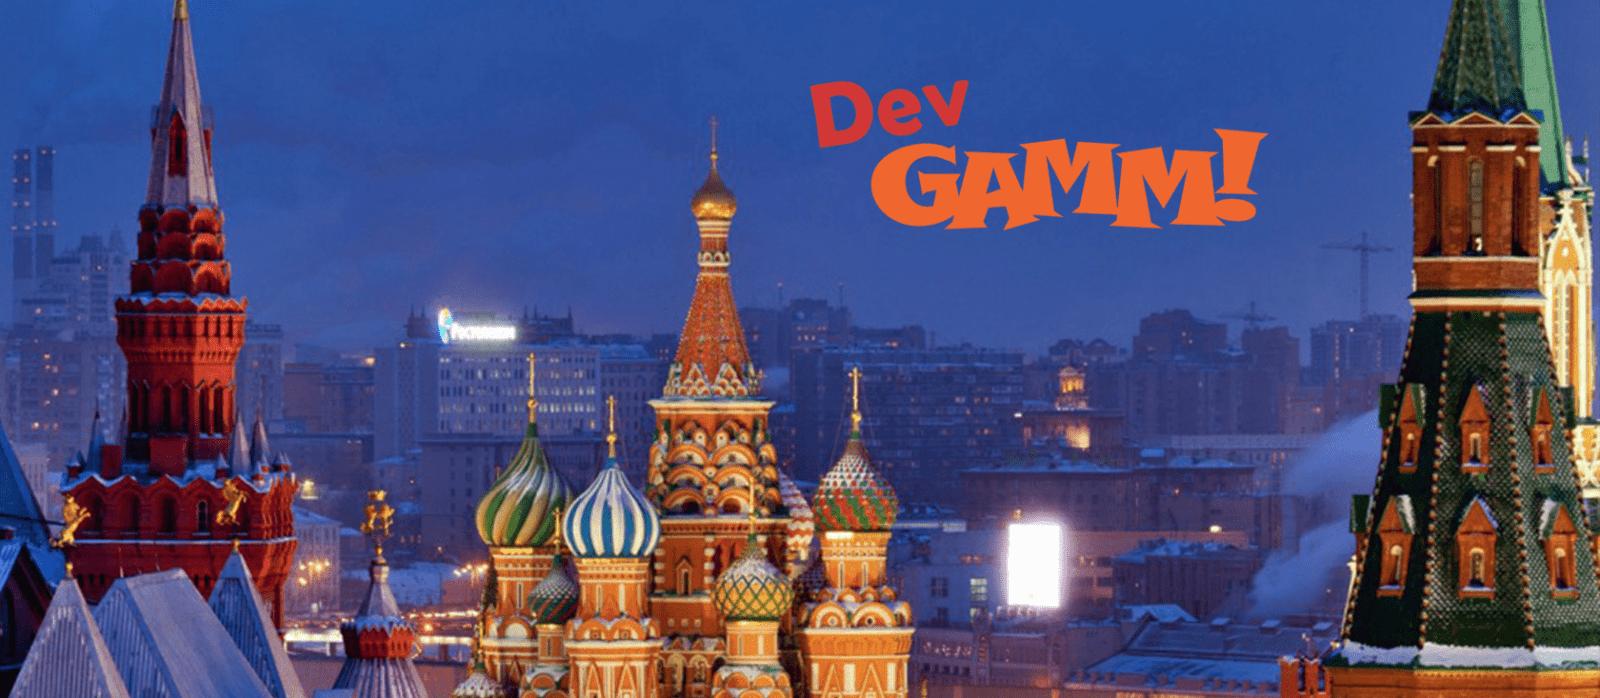 DevGAMM Moscow 2018